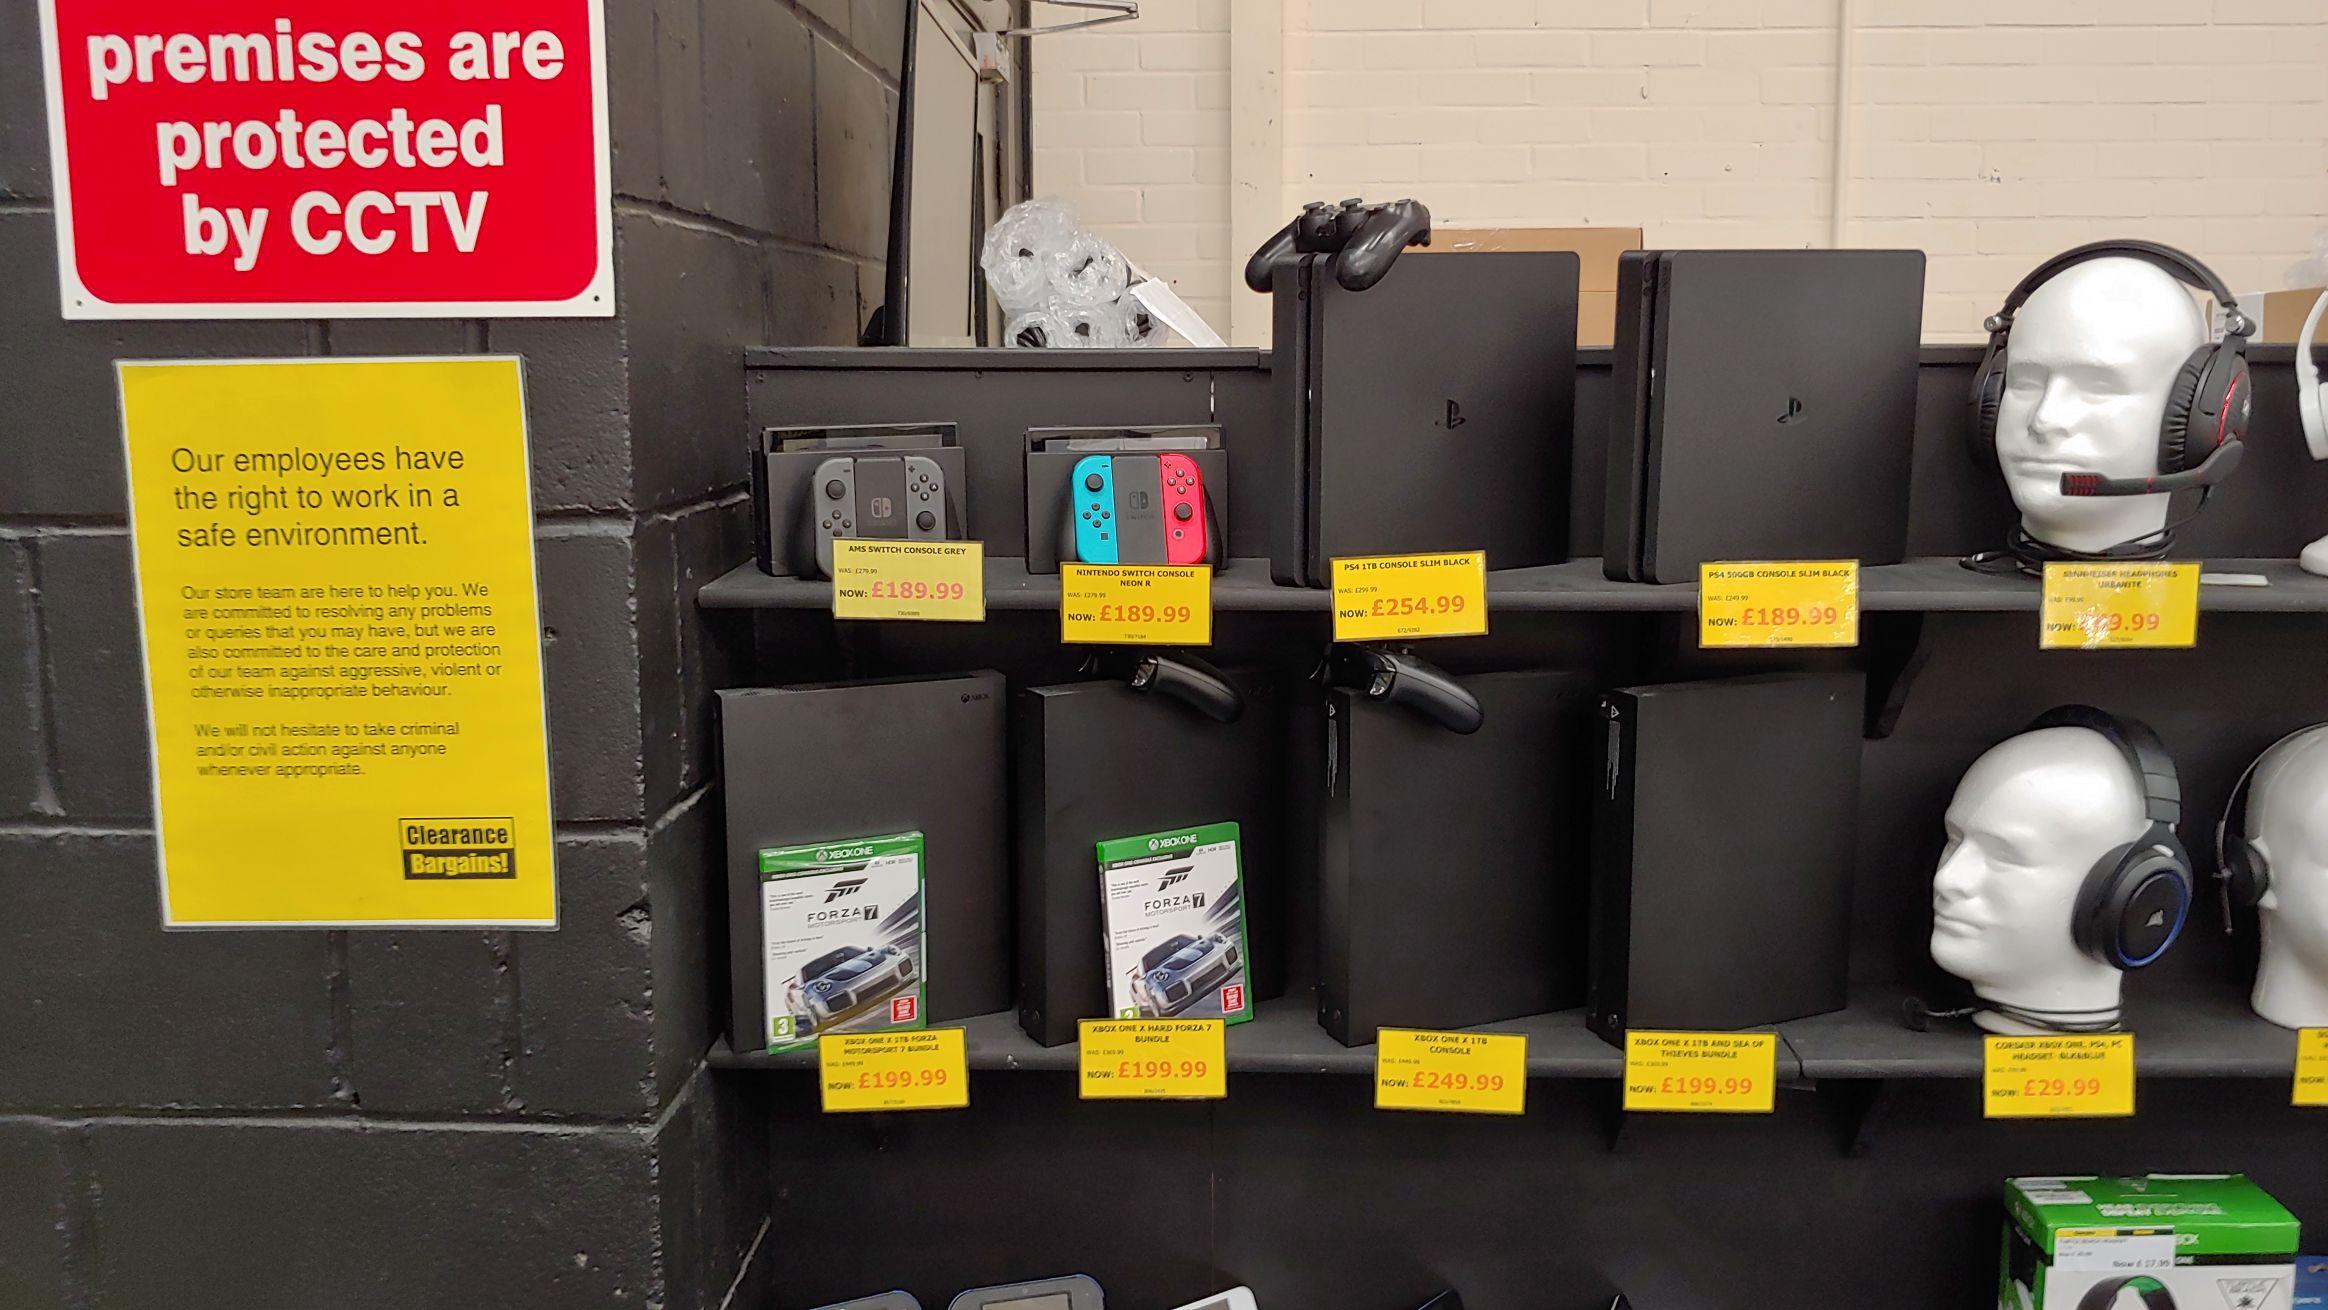 Nintendo Switch £189.99 / XBox One X - £199.99 at Argos Clearance Corby (refurb stock)